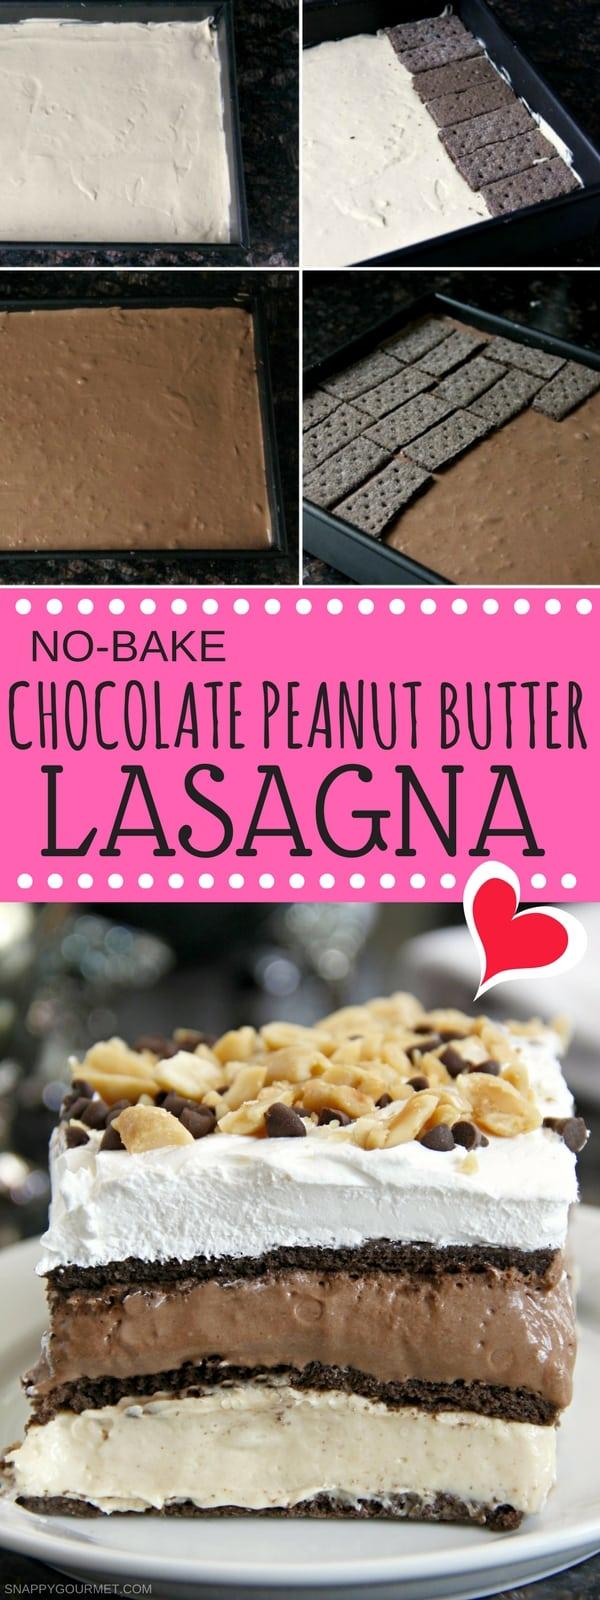 No Bake Chocolate Peanut Butter Lasagna recipe - an easy refrigerator cake or graham cracker cake recipe with a layer of chocolate and a layer of peanut butter. SnappyGourmet.com